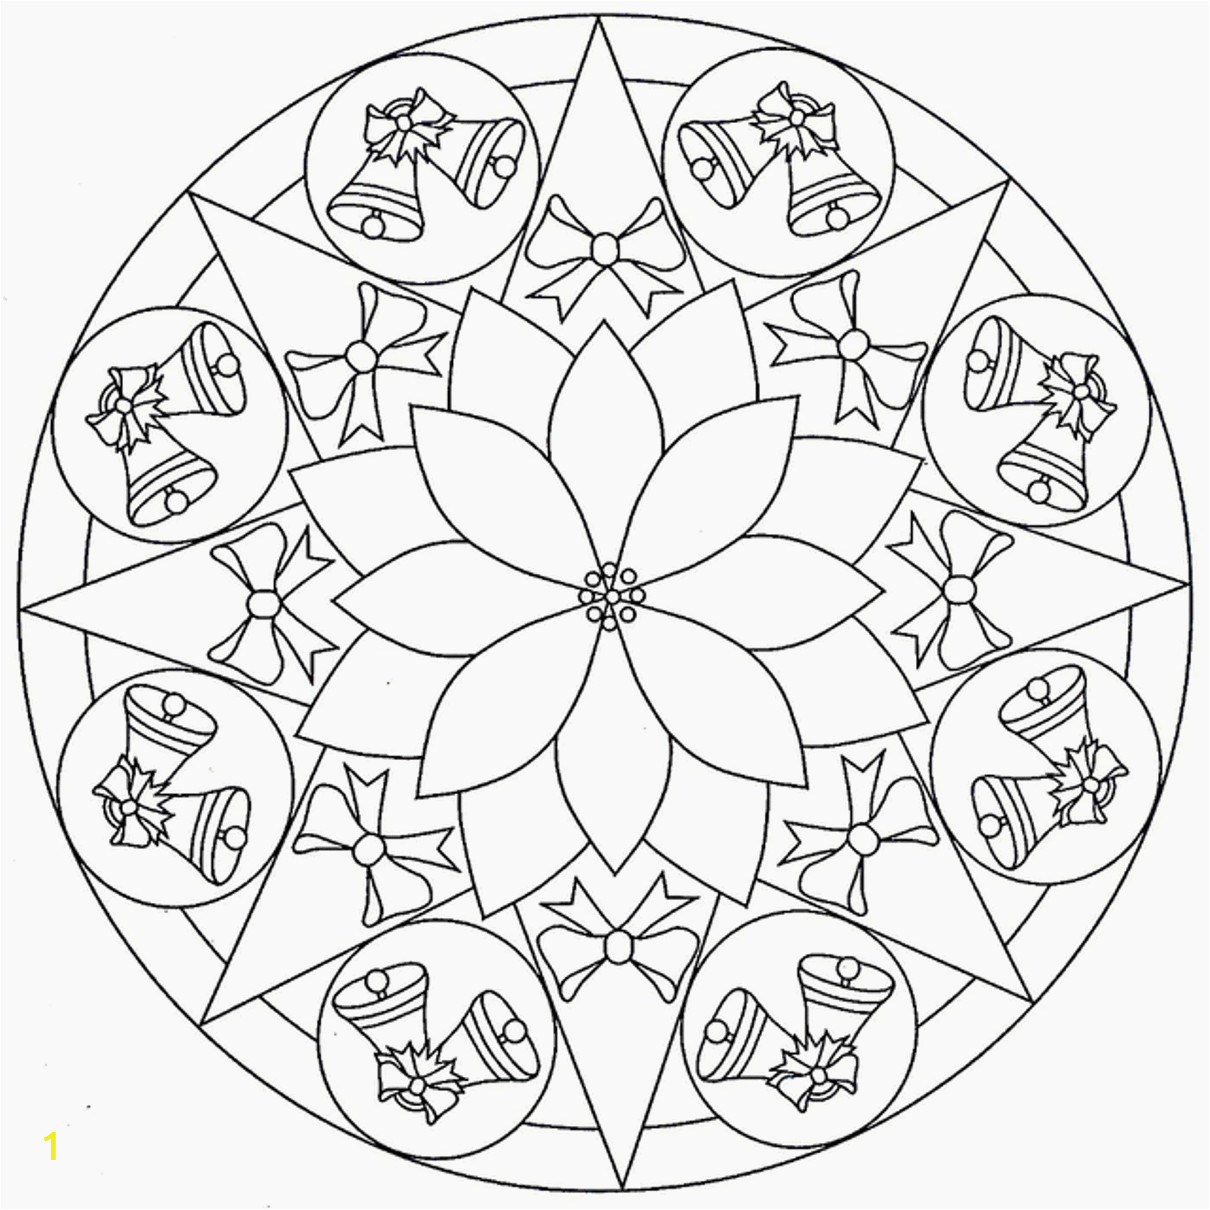 Free Printable Christmas Mandala Coloring Pages Christmas Mandala Coloring Pages to and Print for